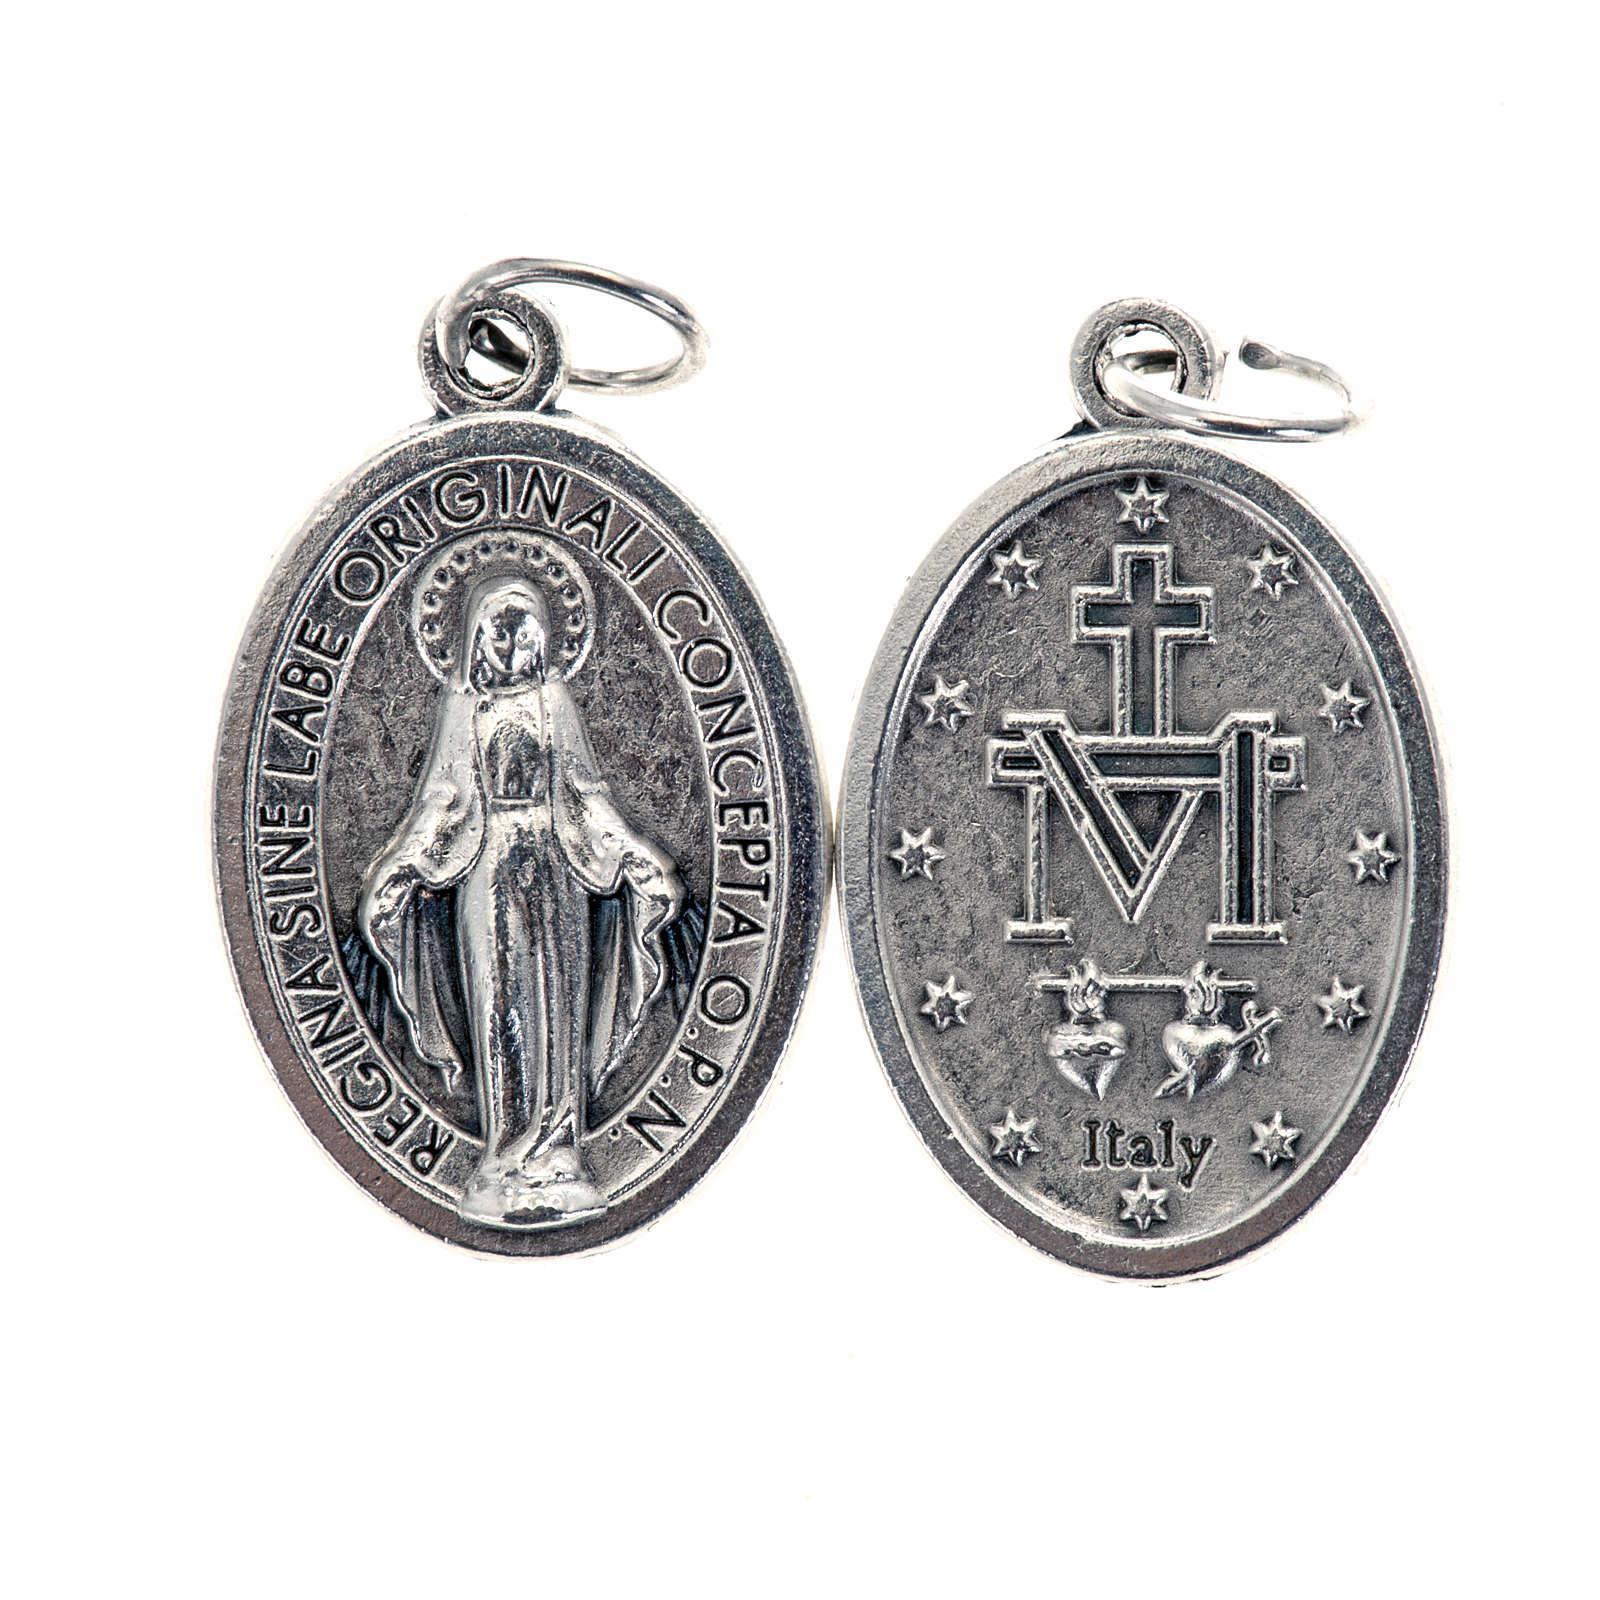 Medalla Milagrosa ovalado metal plateado 21mm 4